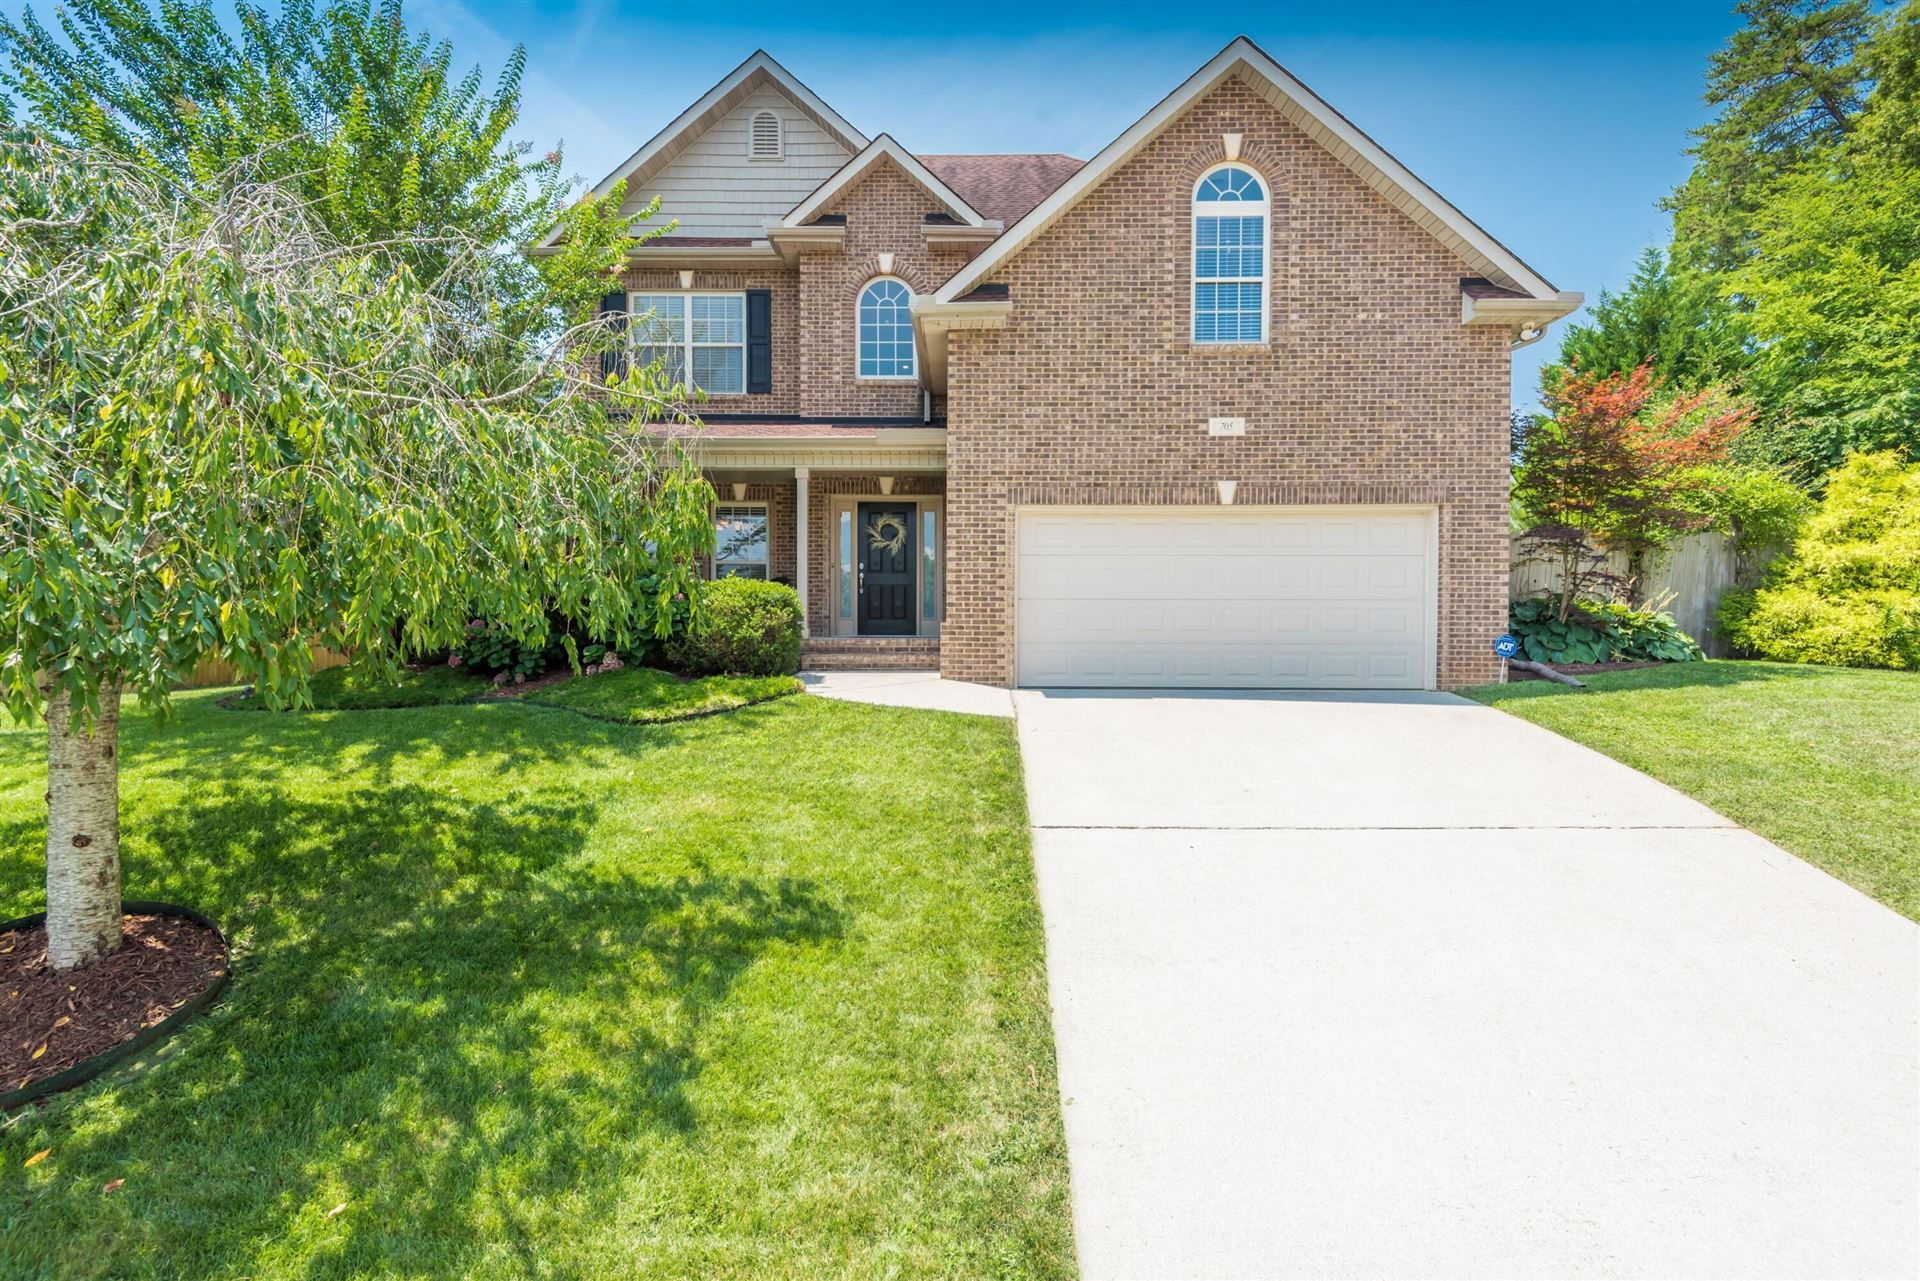 705 Mercedes Lane, Knoxville, TN 37934 - MLS#: 1161834